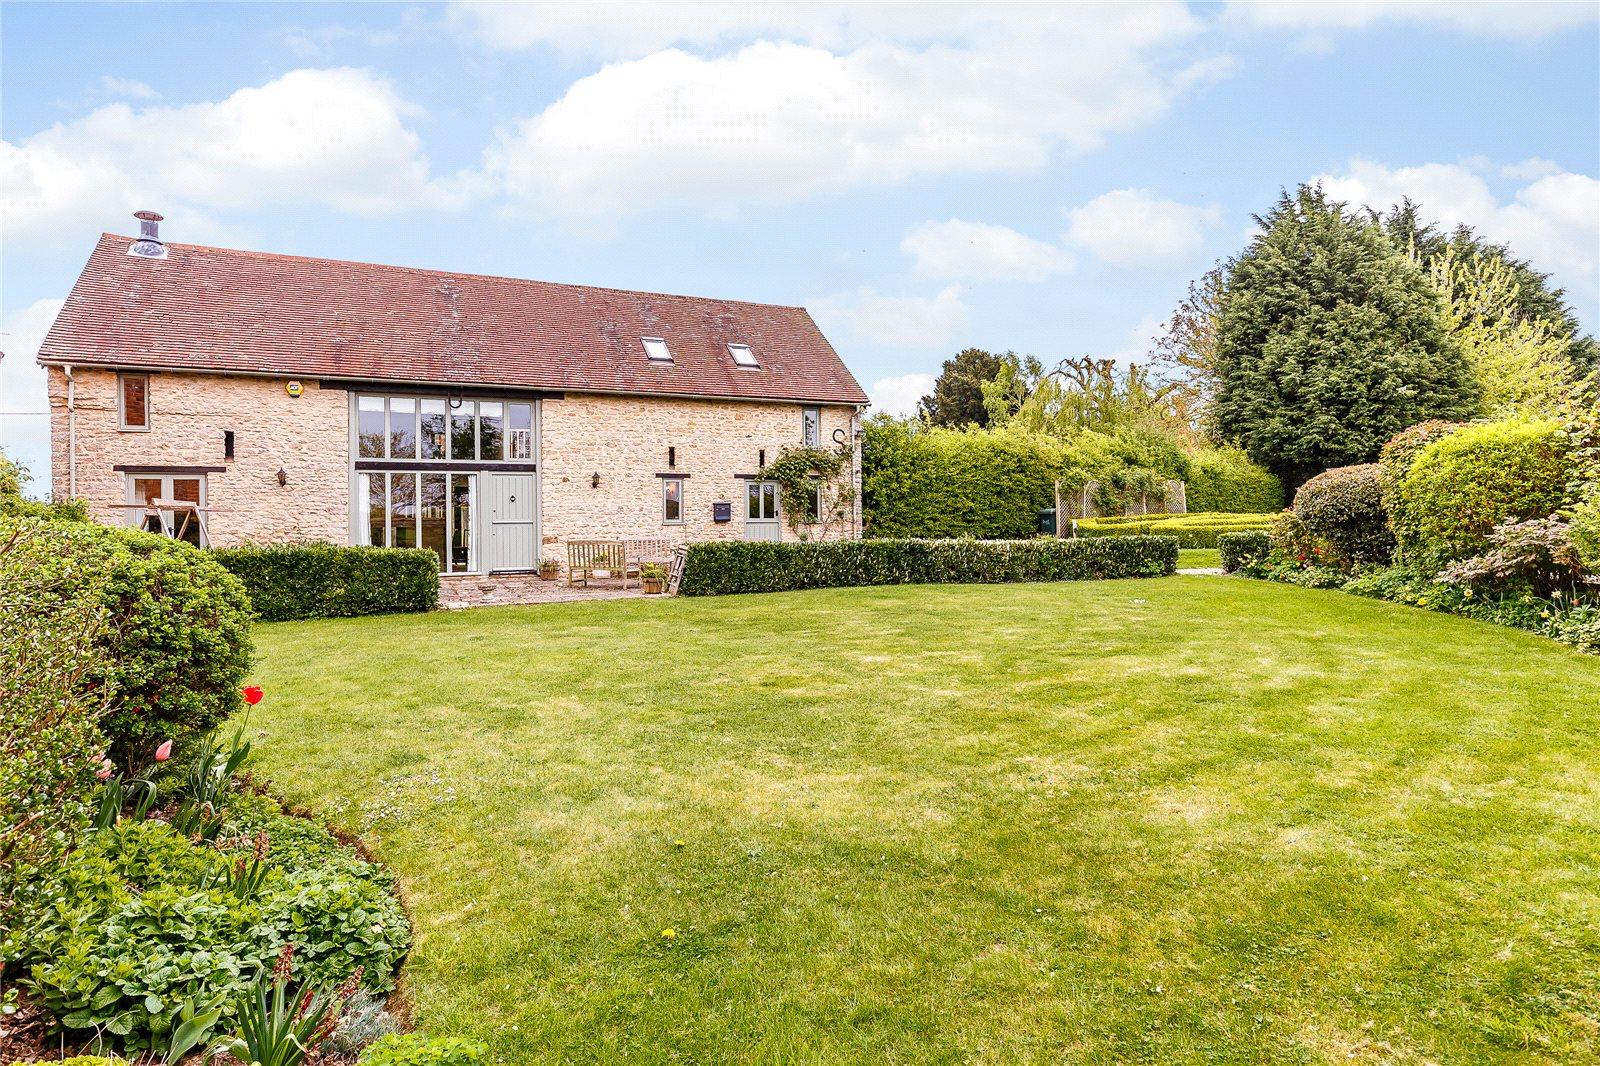 Частный дом для того Продажа на Fringford, Bicester, Oxfordshire, OX27 Bicester, Англия